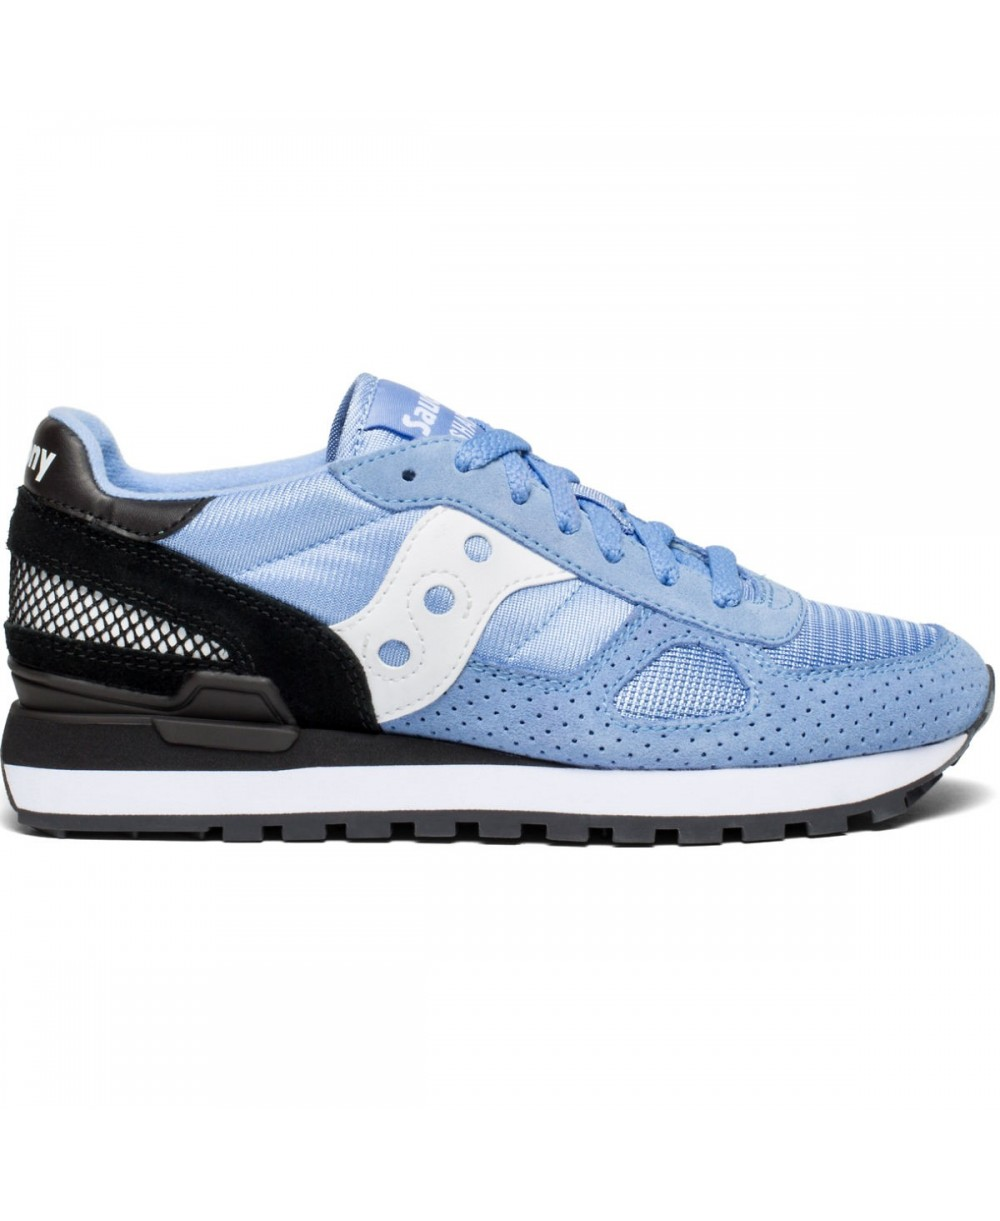 pretty nice 9c951 6b230 Shadow Original Scarpe Sneakers Donna Blue/Black